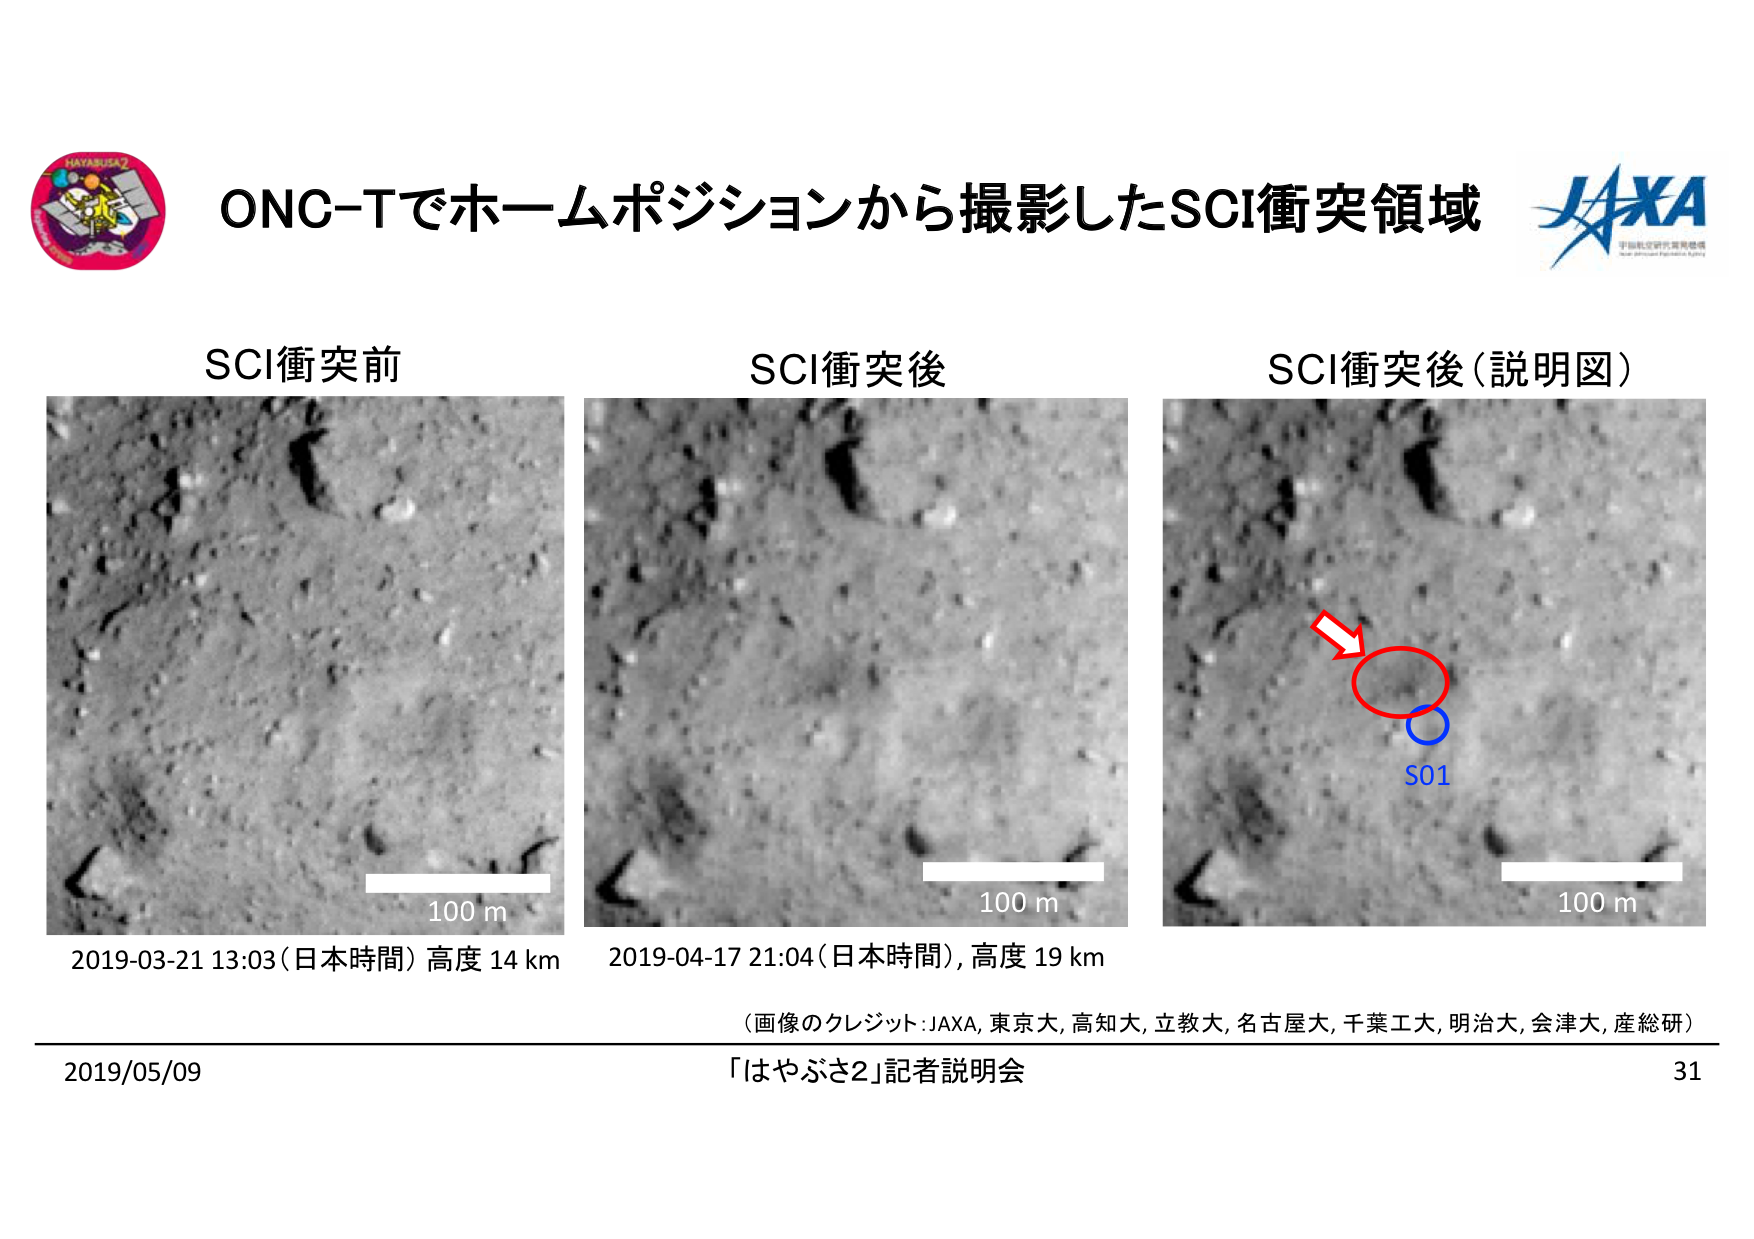 f:id:Imamura:20190509154427p:plain